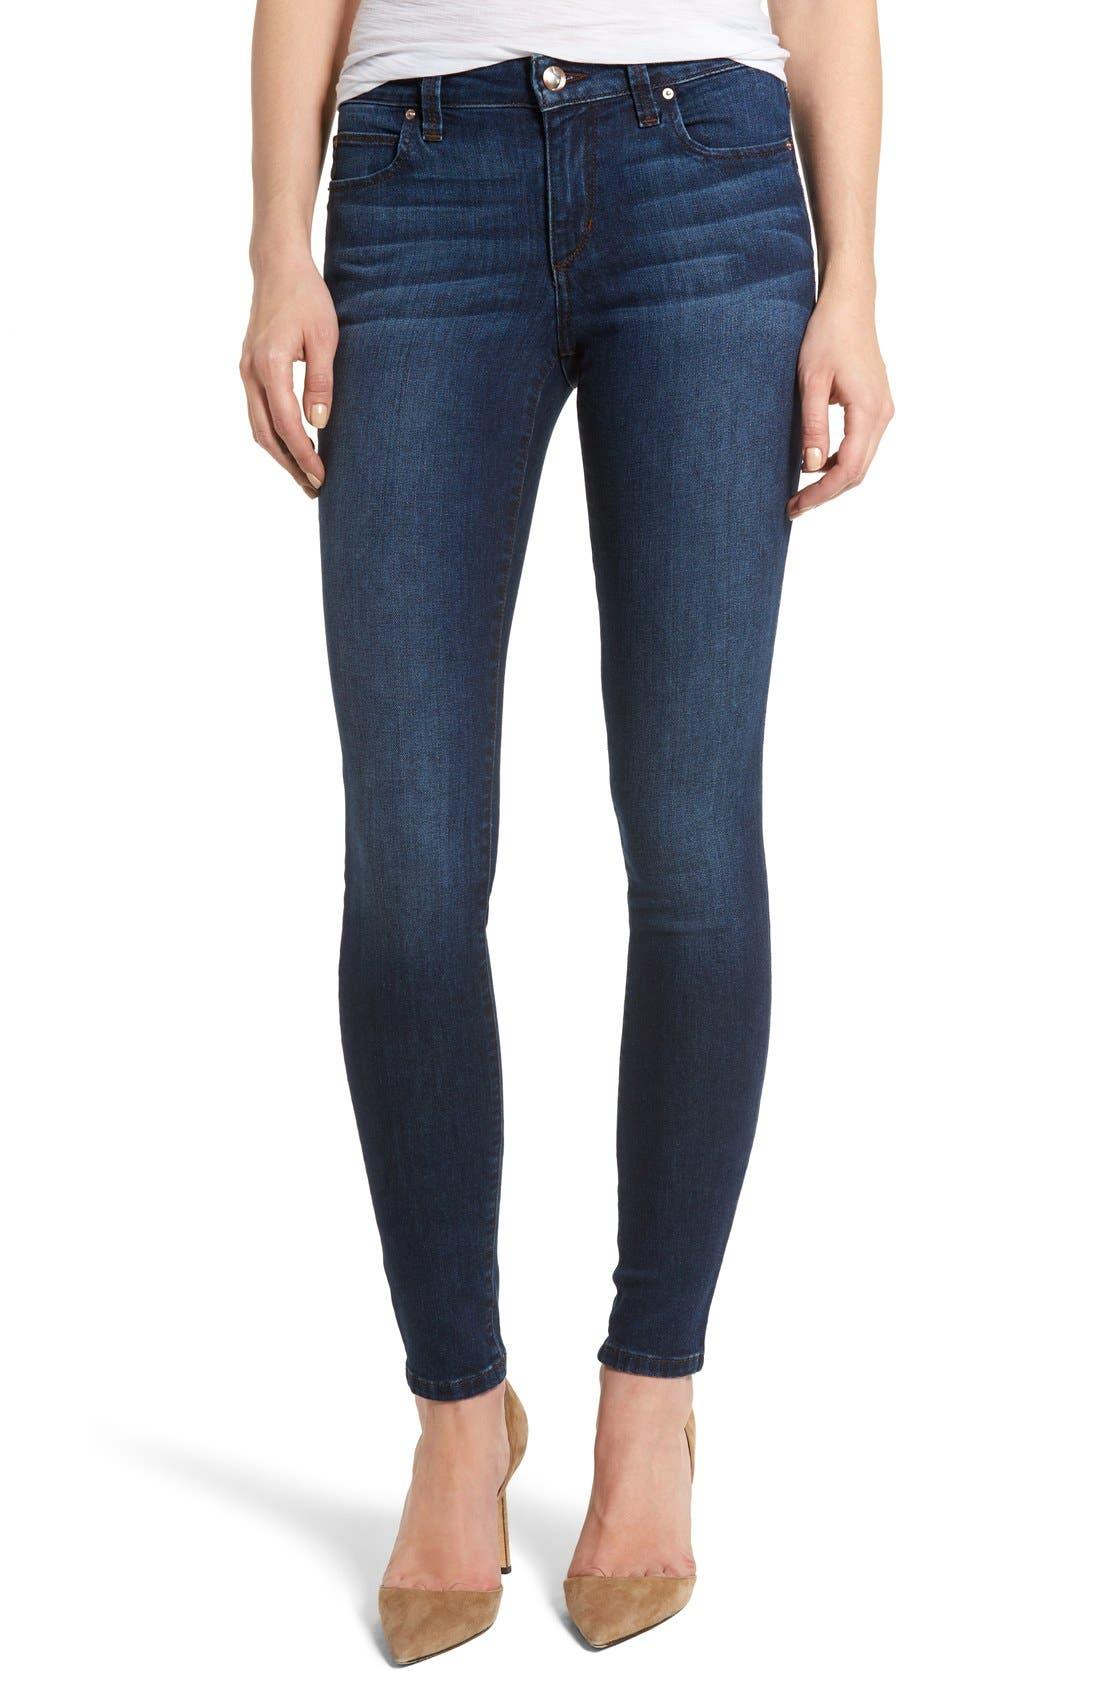 Honey Skinny Jeans,                             Main thumbnail 1, color,                             410